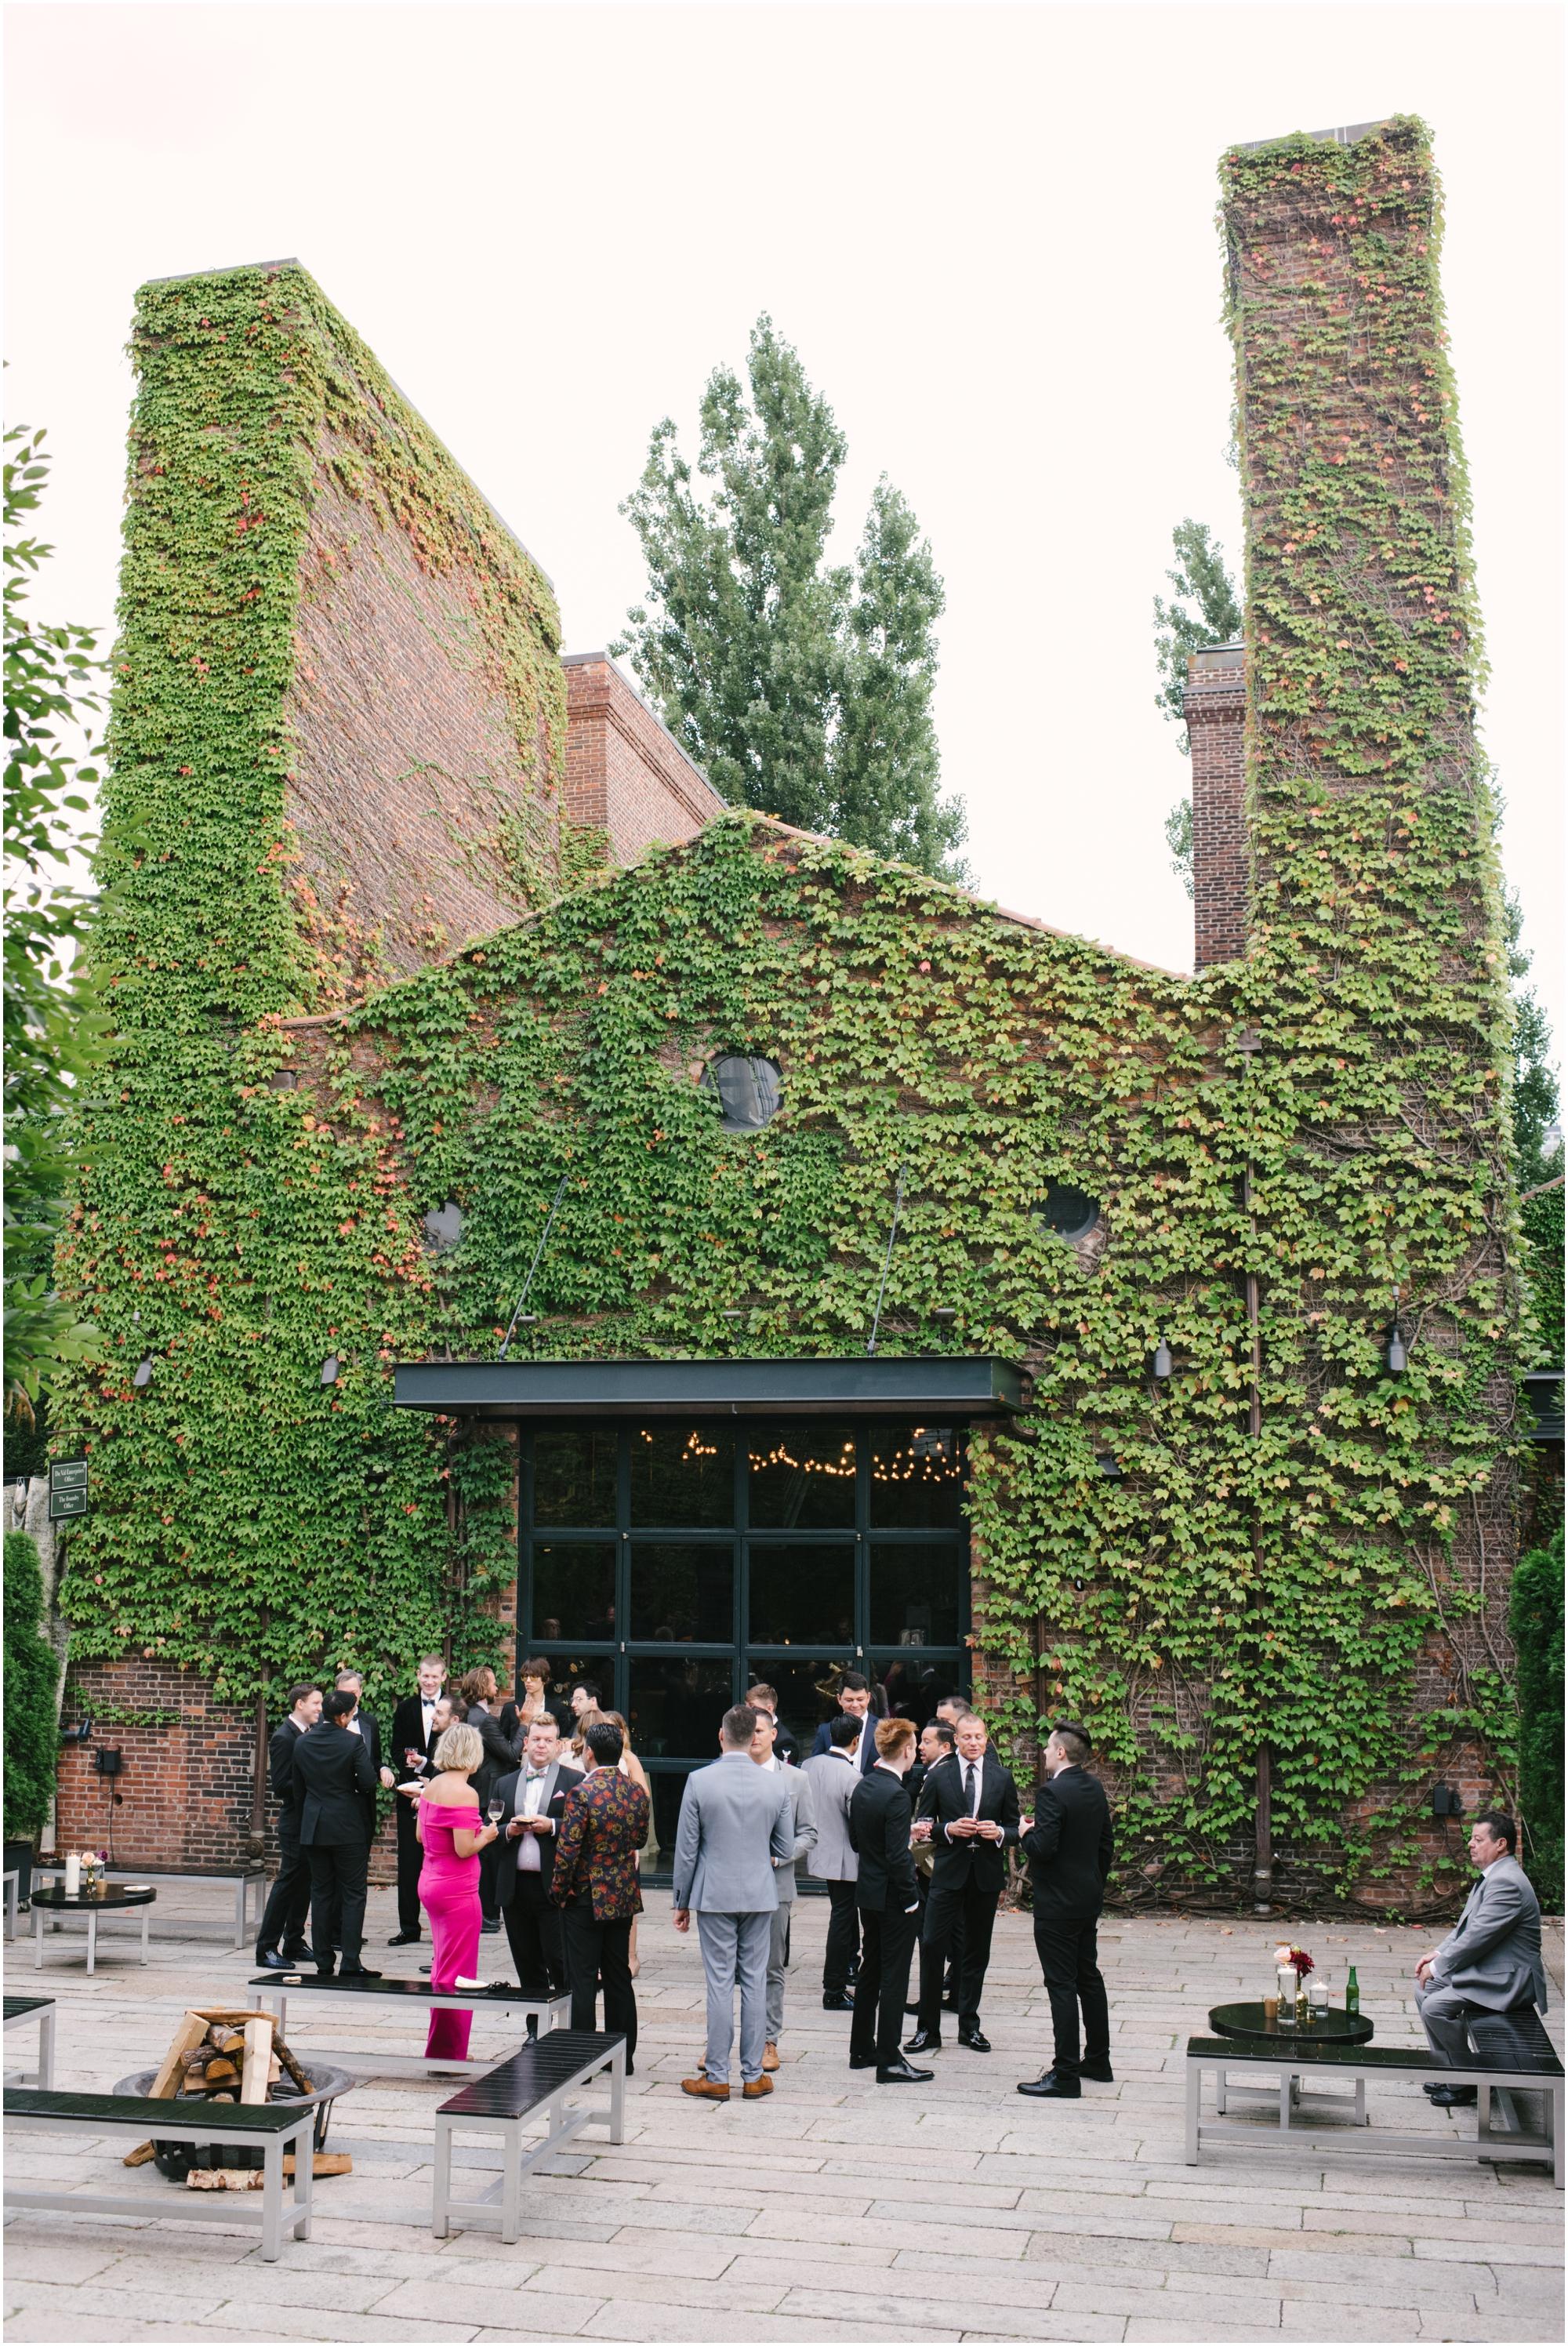 gay-wedding-photographer-williamsburgphotostudios-thefoundry-wedding-photographer_0024.jpg